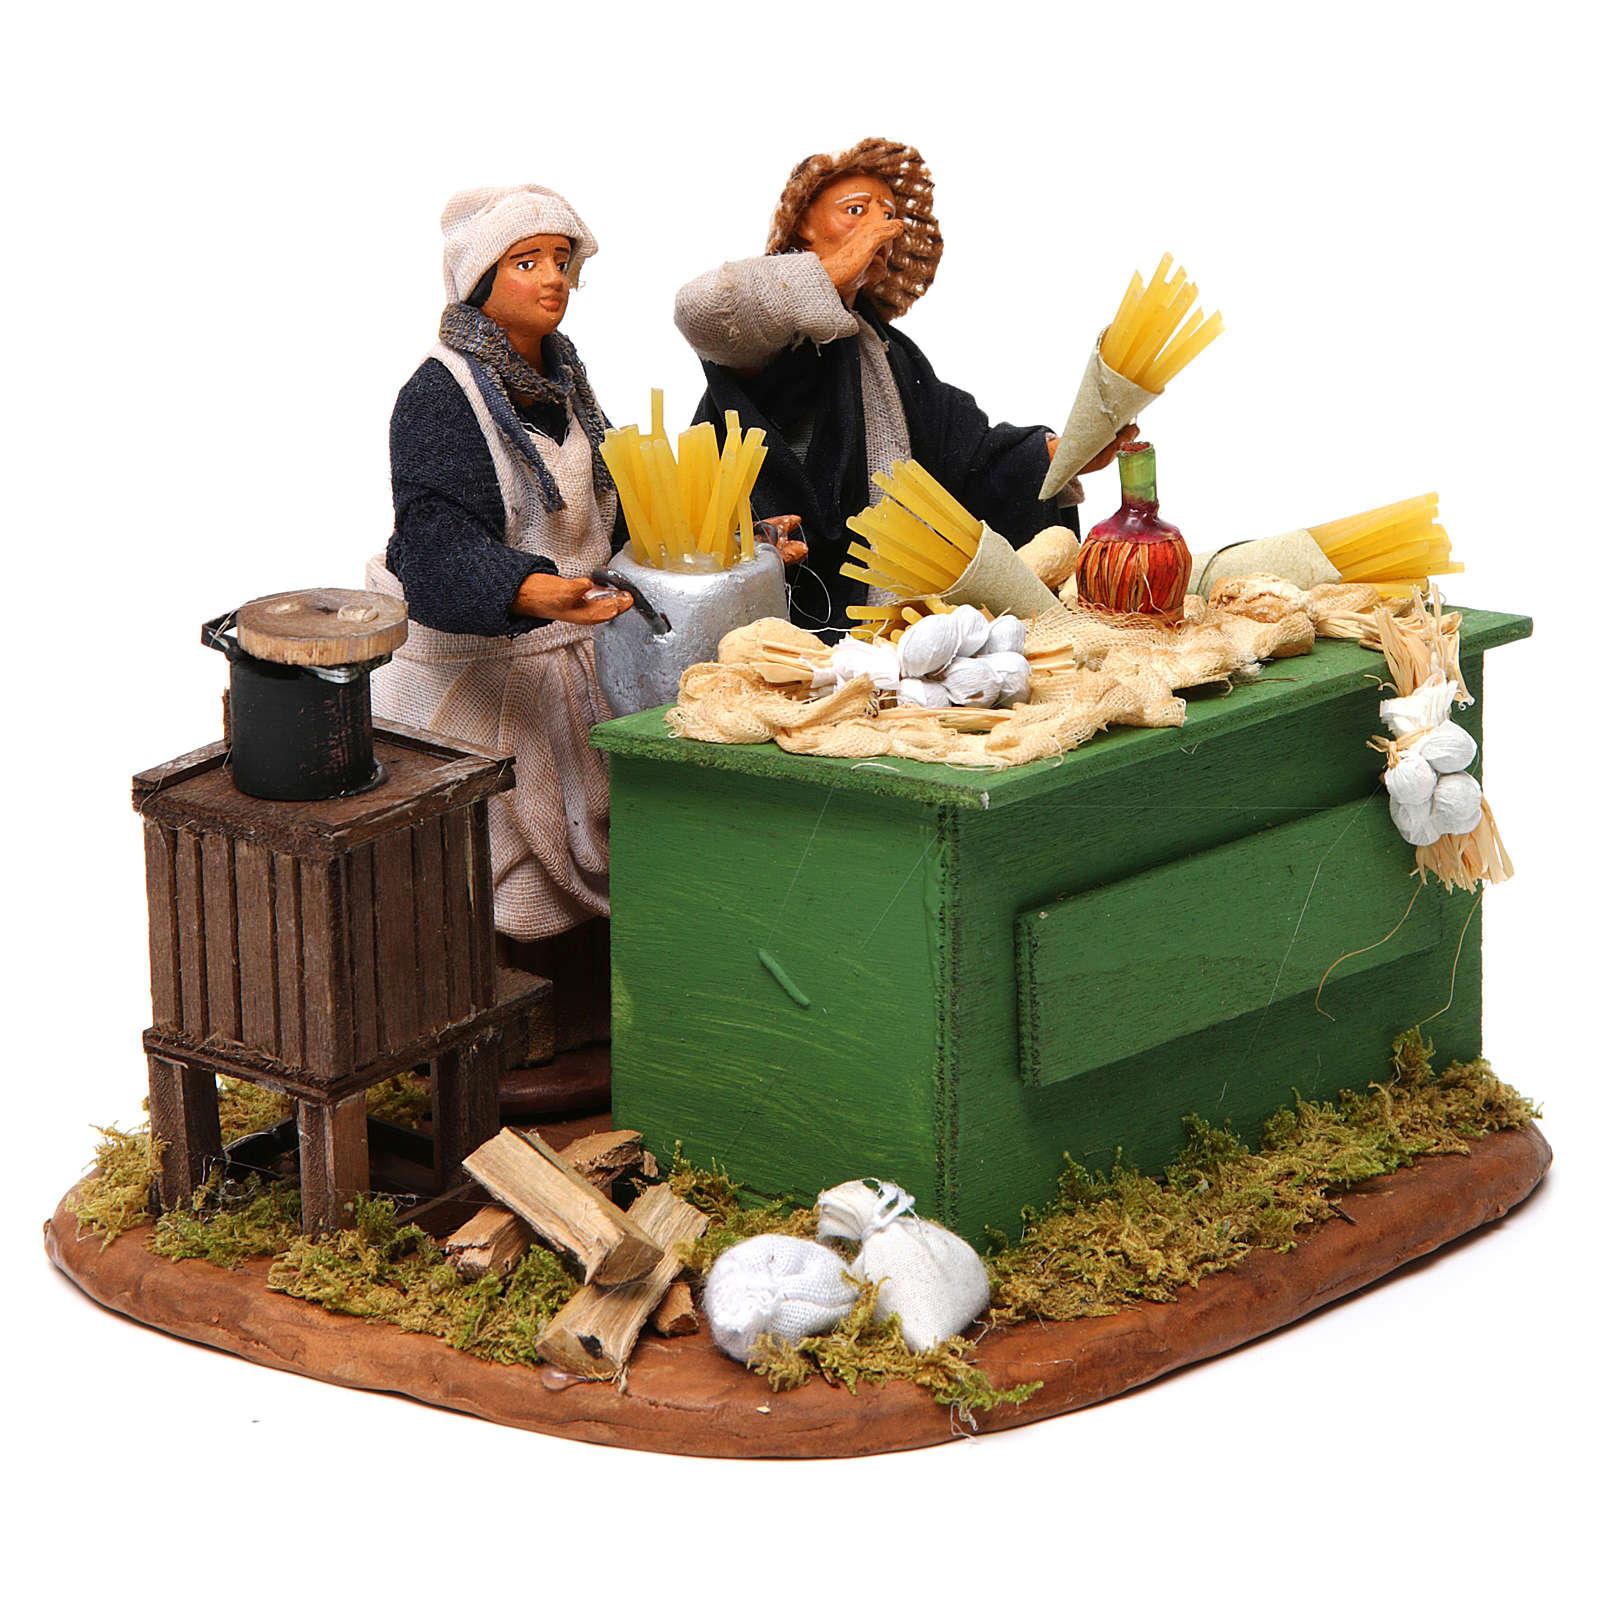 Man making pasta with stall, Neapolitan nativity figurine 12cm 4